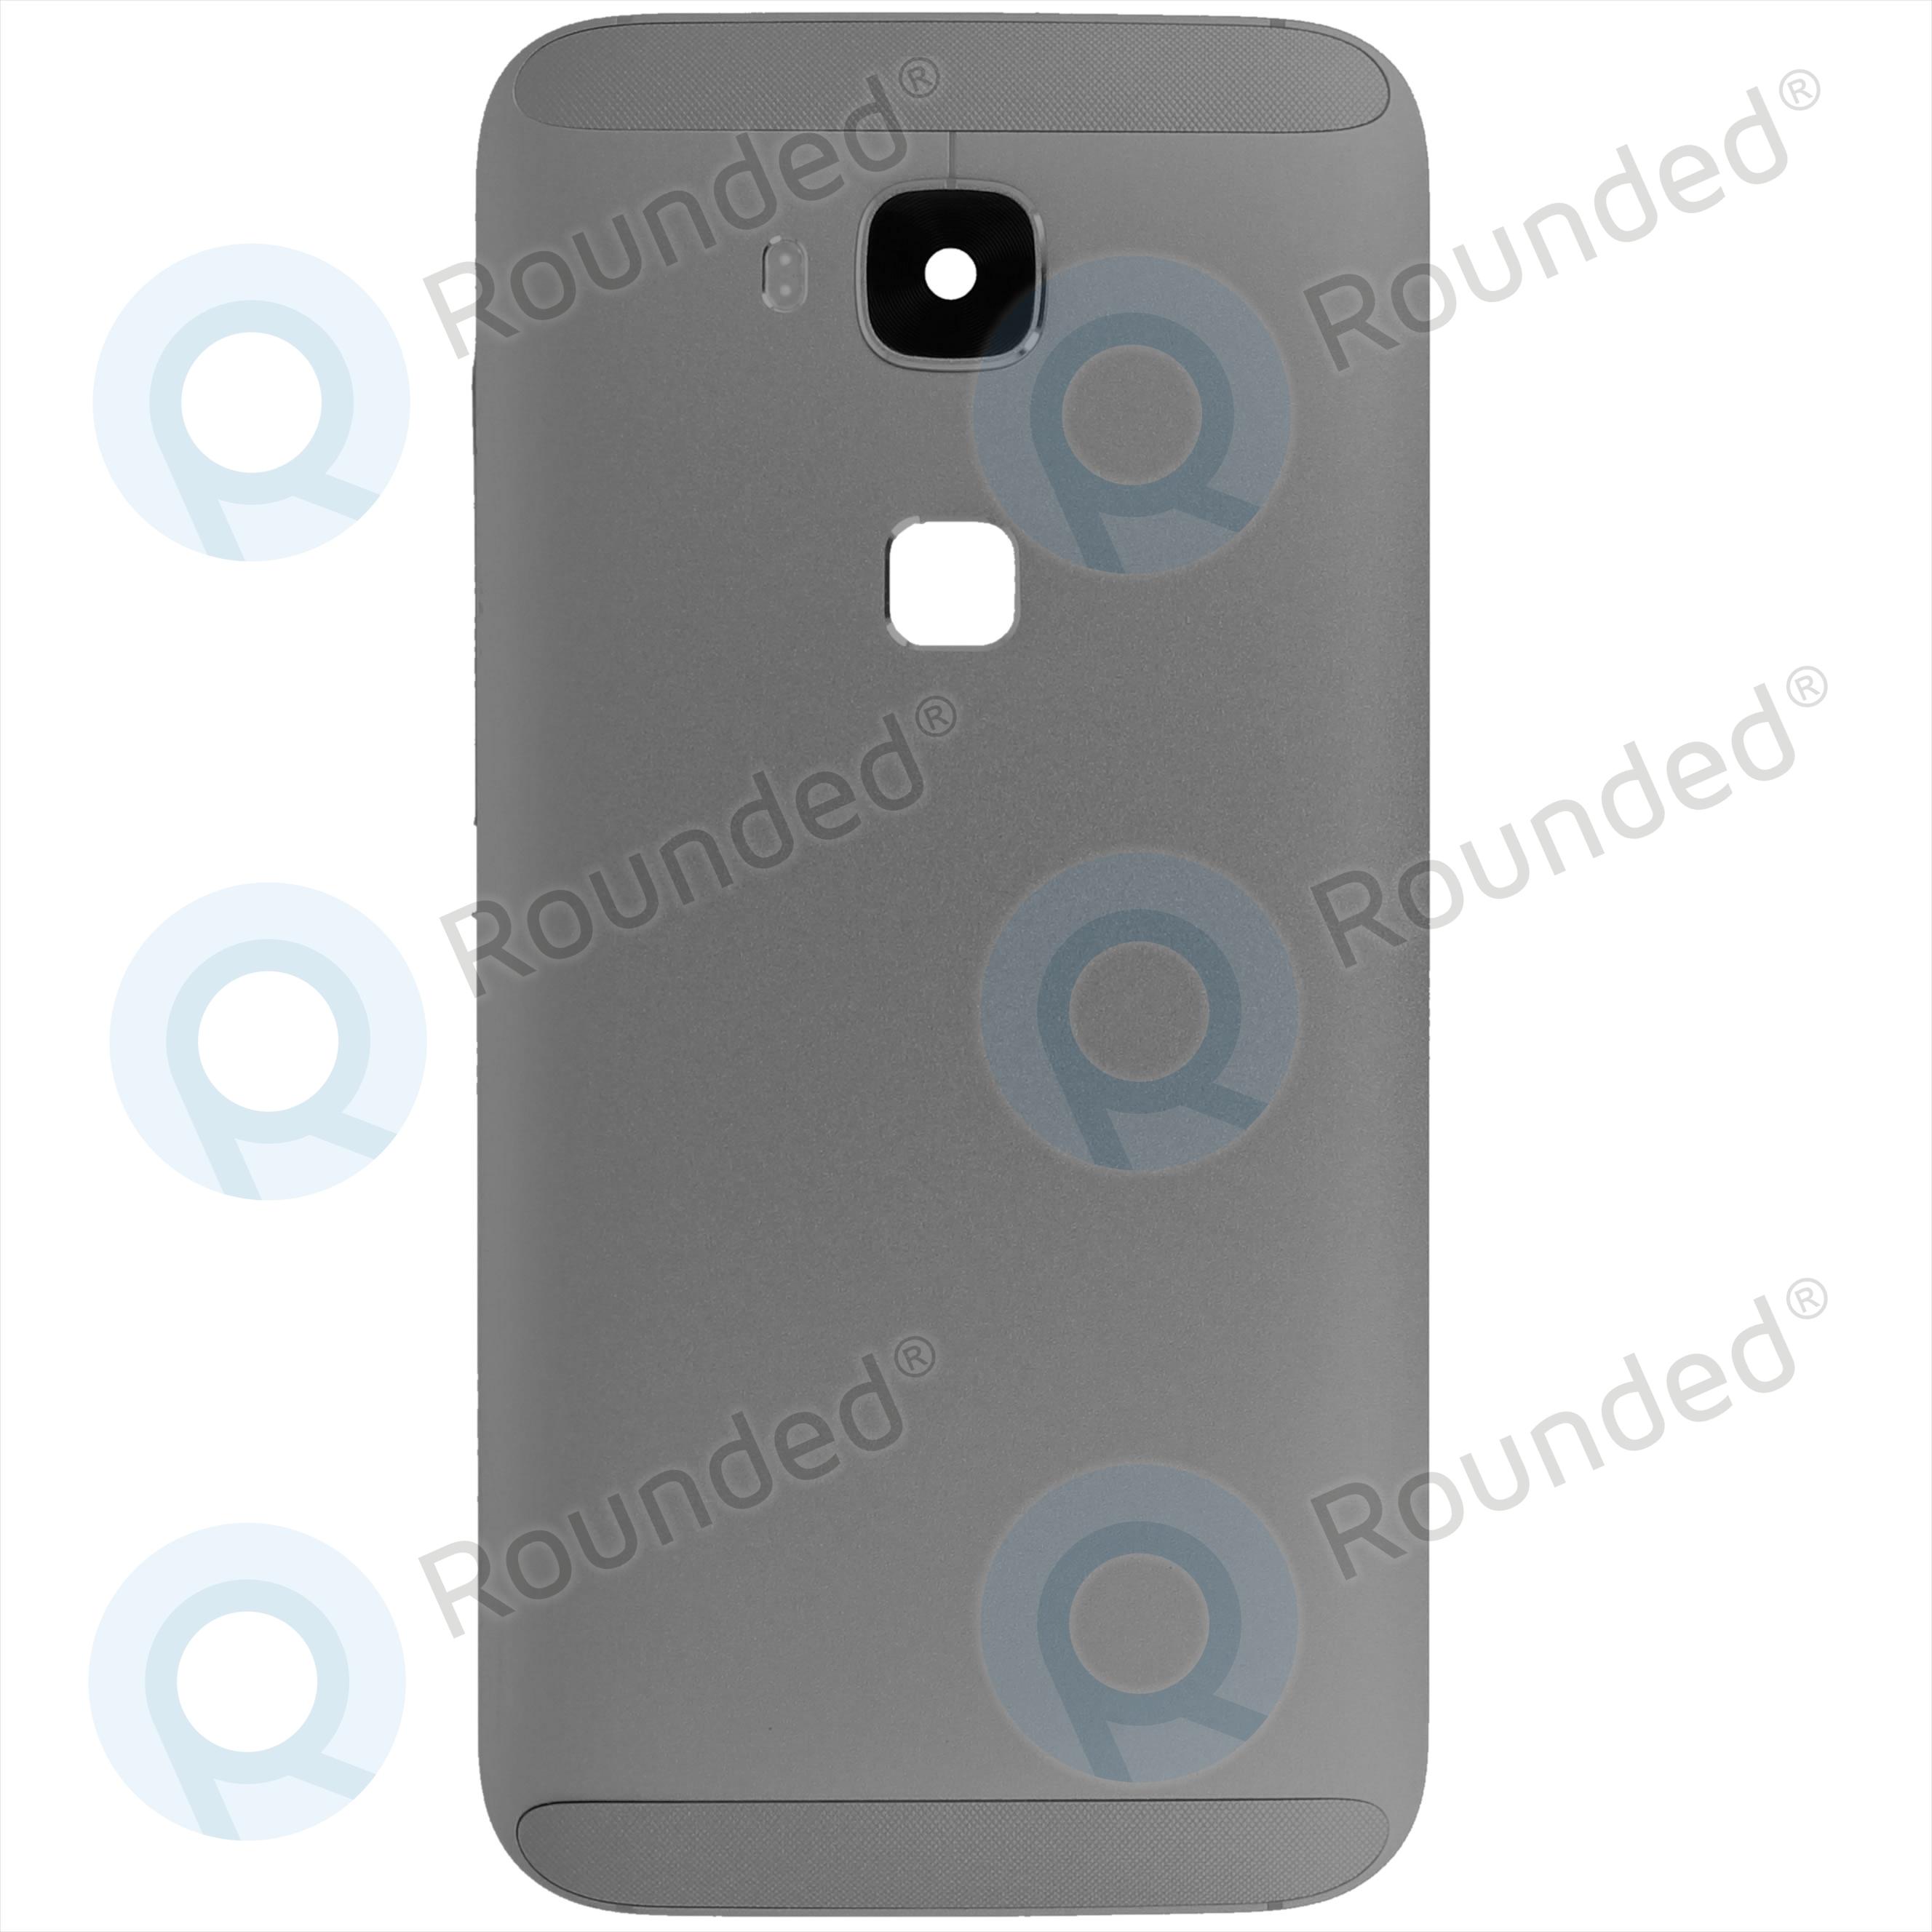 Huawei G8 Rio L01 Battery Cover Grey